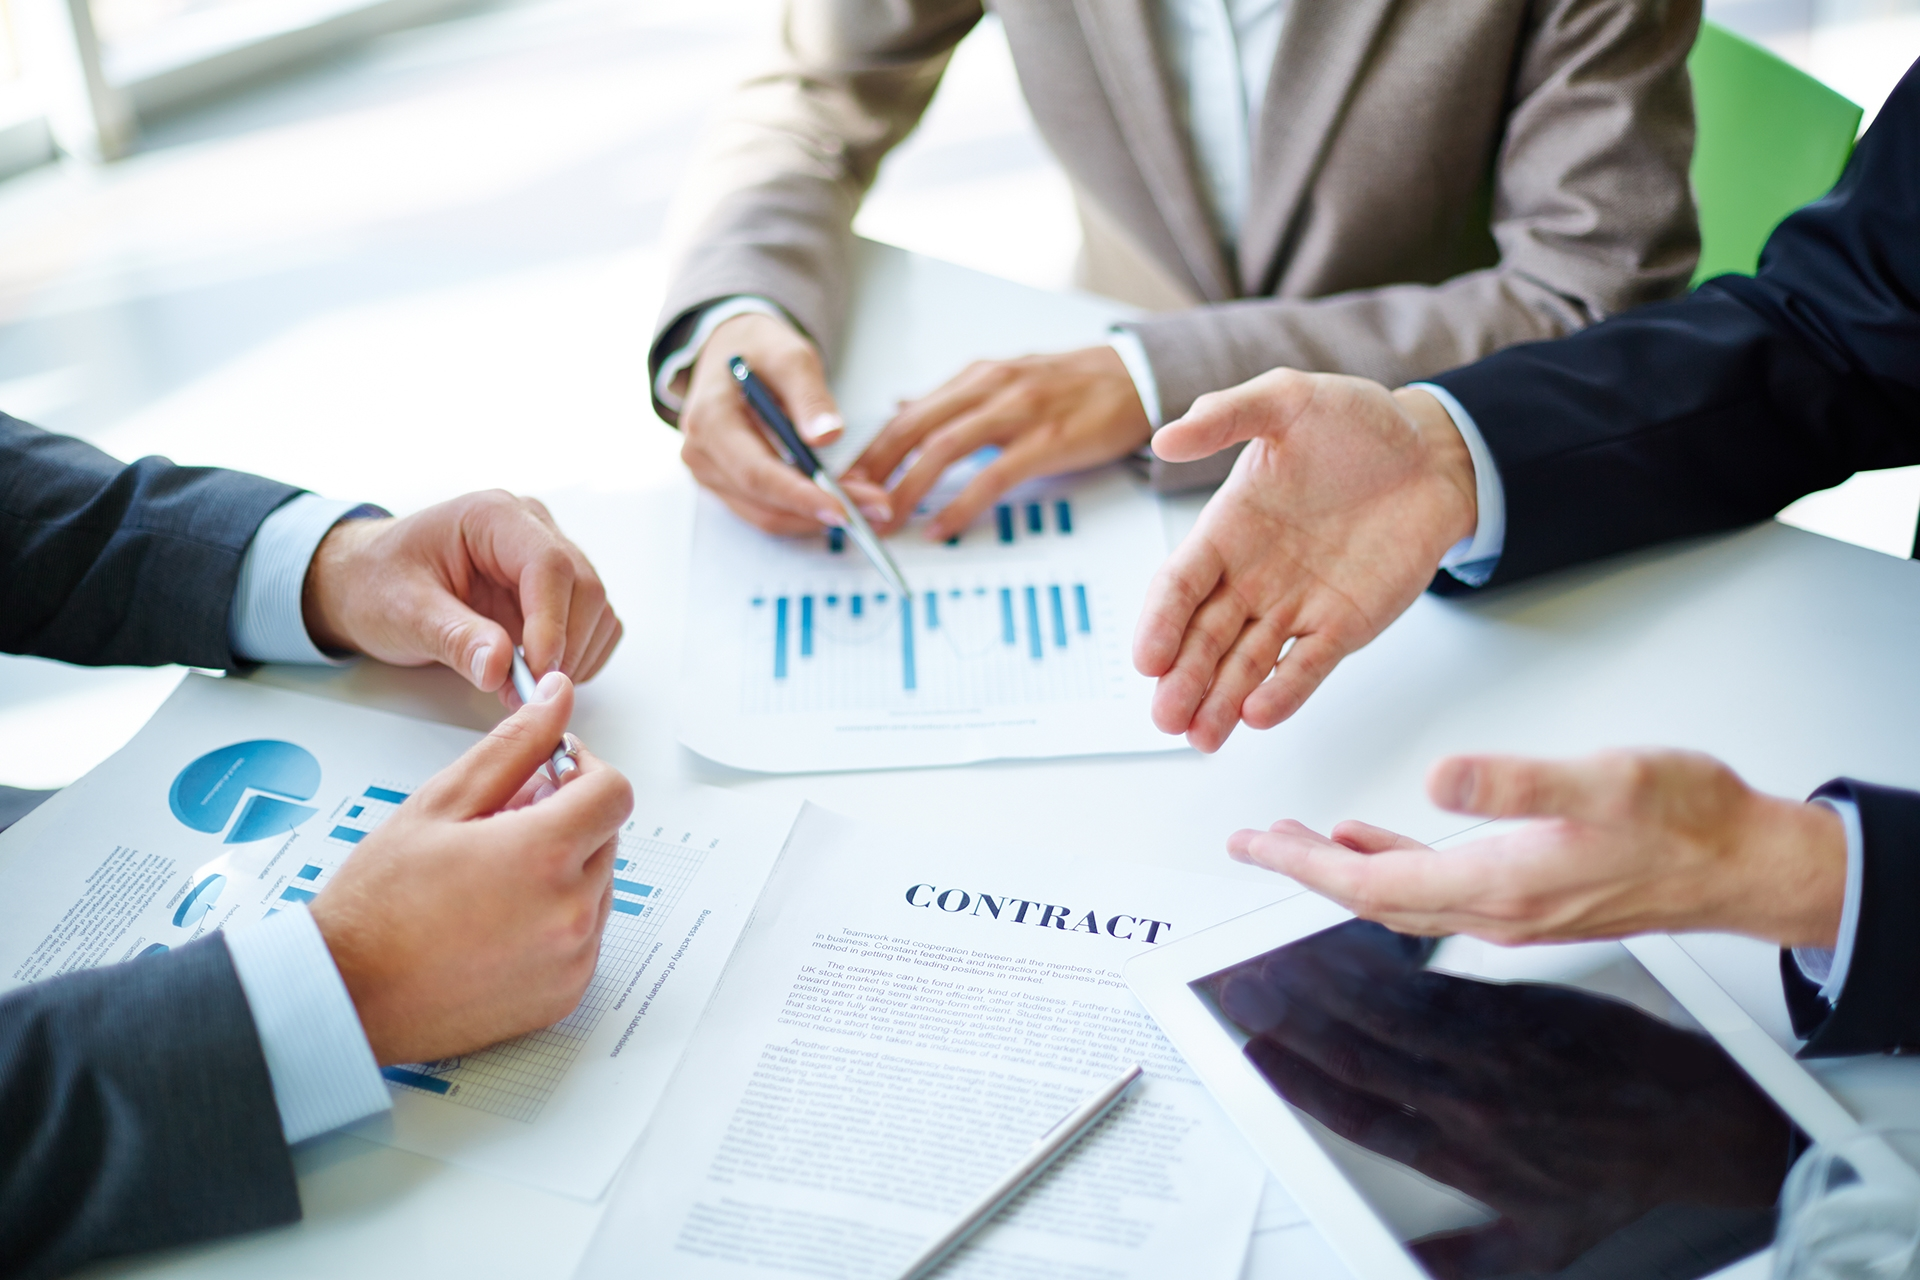 10 Winning Characteristics Of Successful/Effective (Win/Win) Negotiators